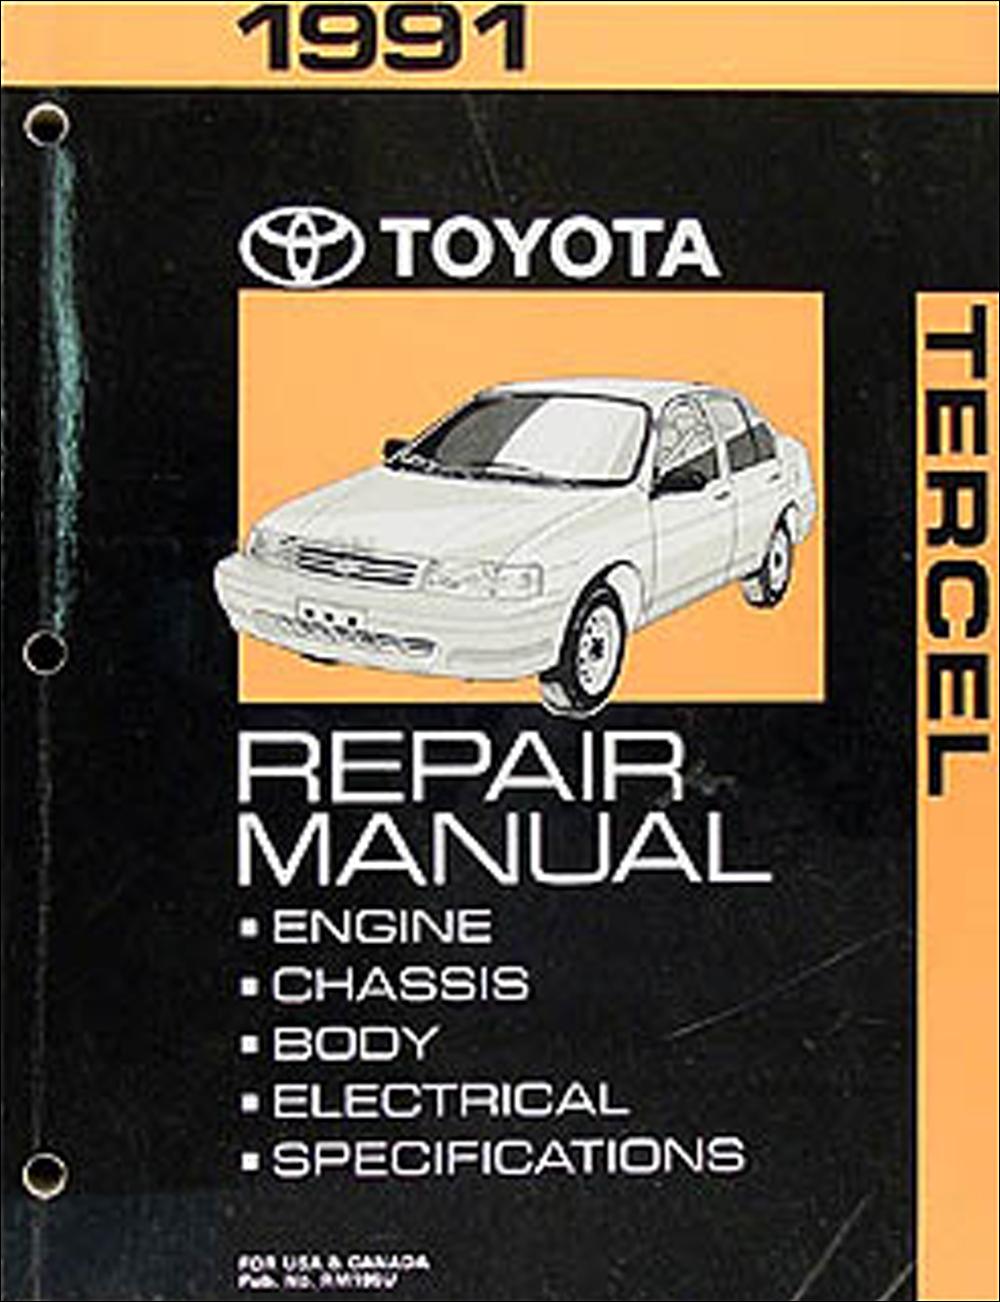 1991 Toyota Tercel Corolla 3 Speed Auto Transmission